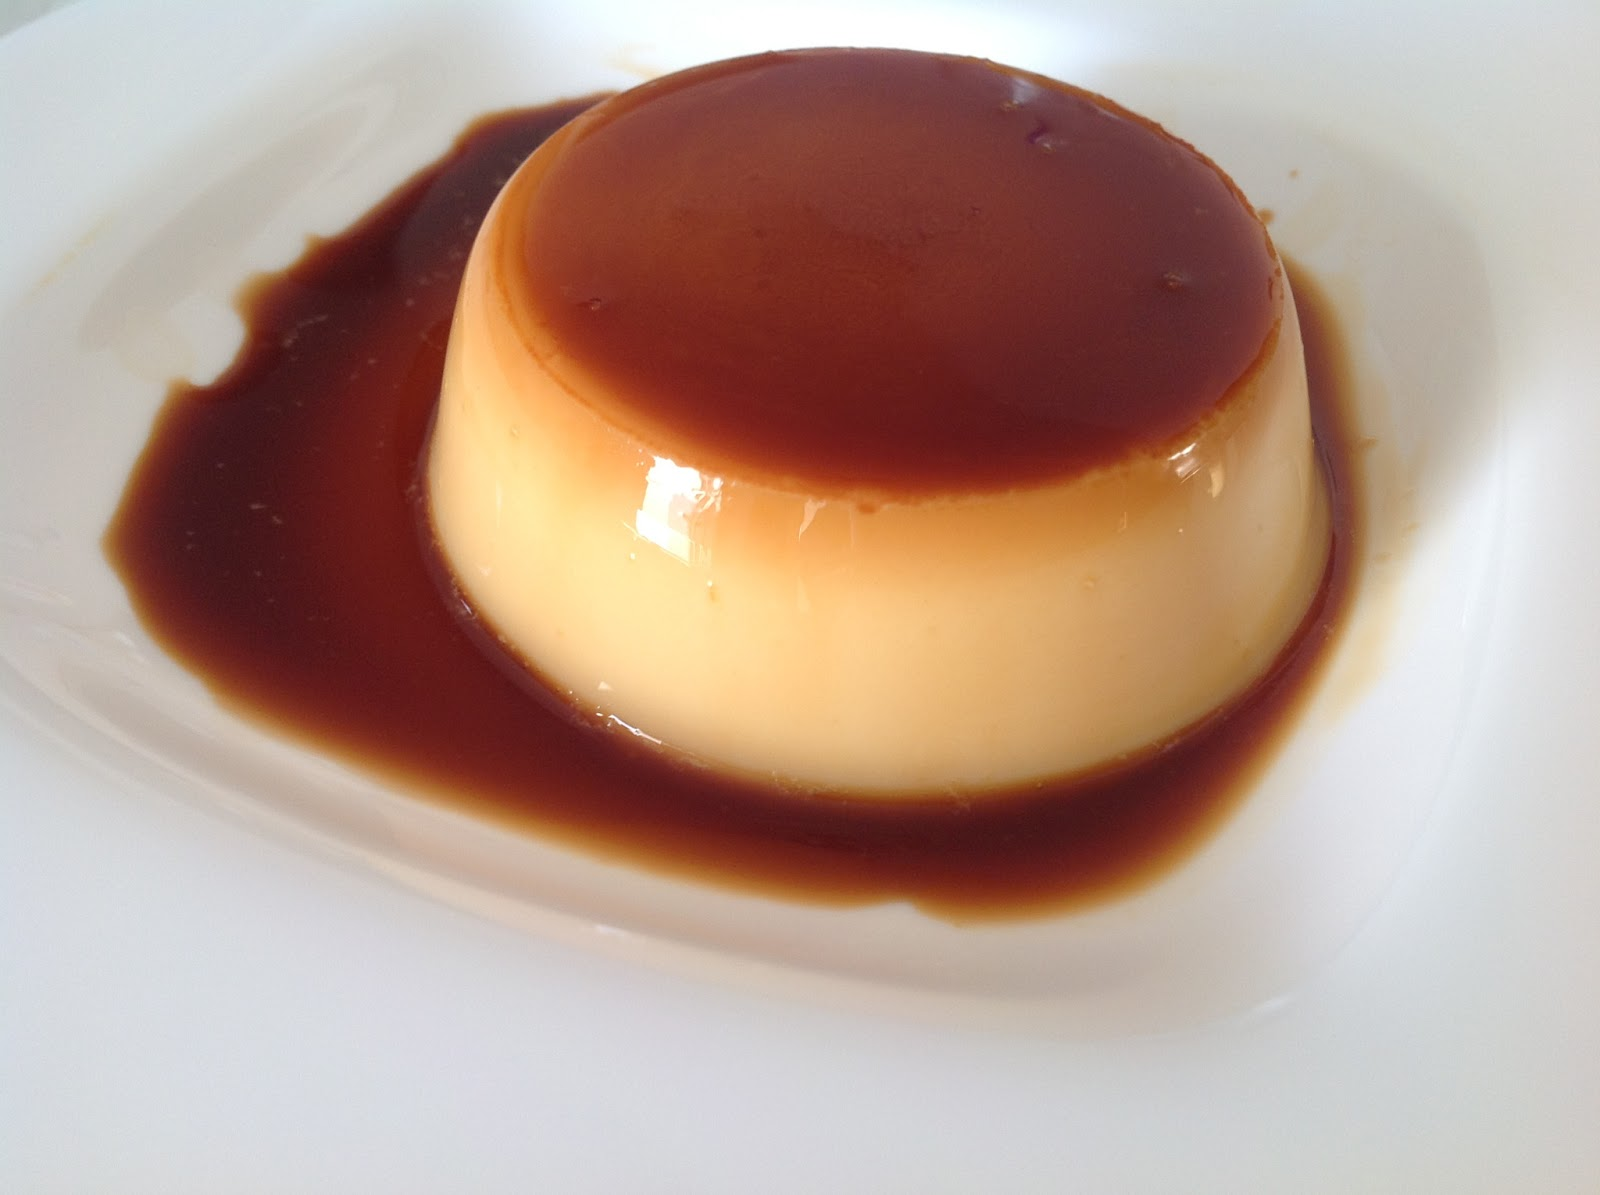 flan au caramel recette facile et inratable mes recettes r ussies. Black Bedroom Furniture Sets. Home Design Ideas